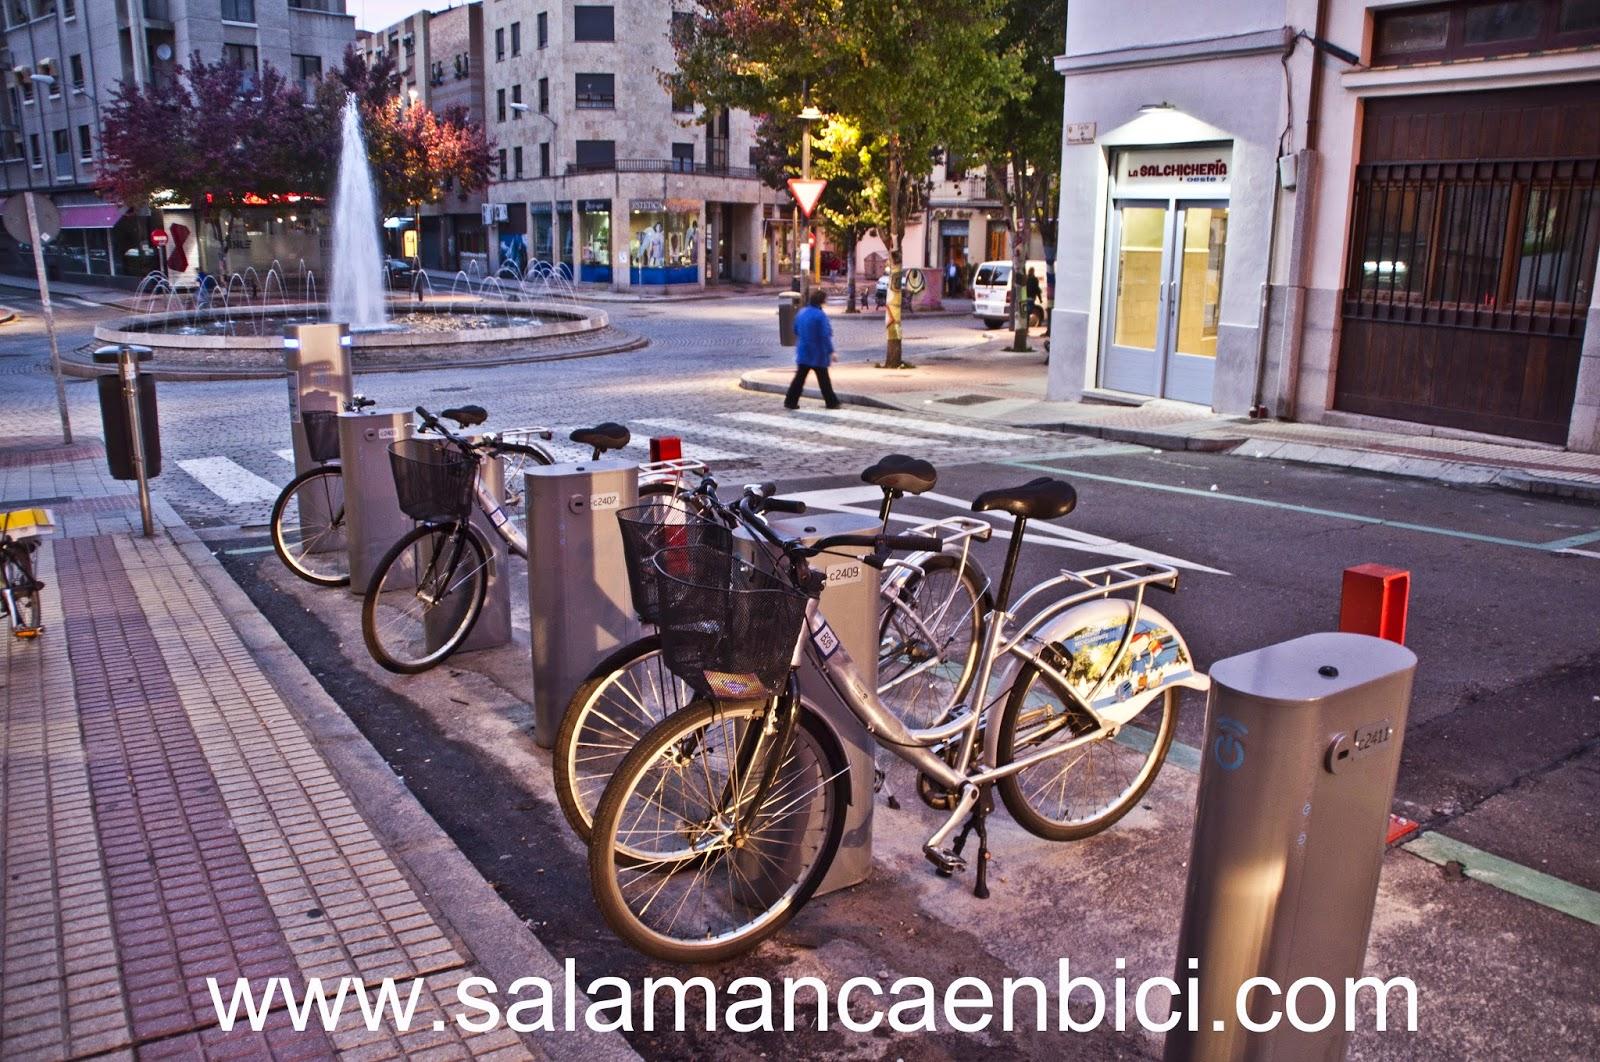 zoes salenbici carril bici salamanca